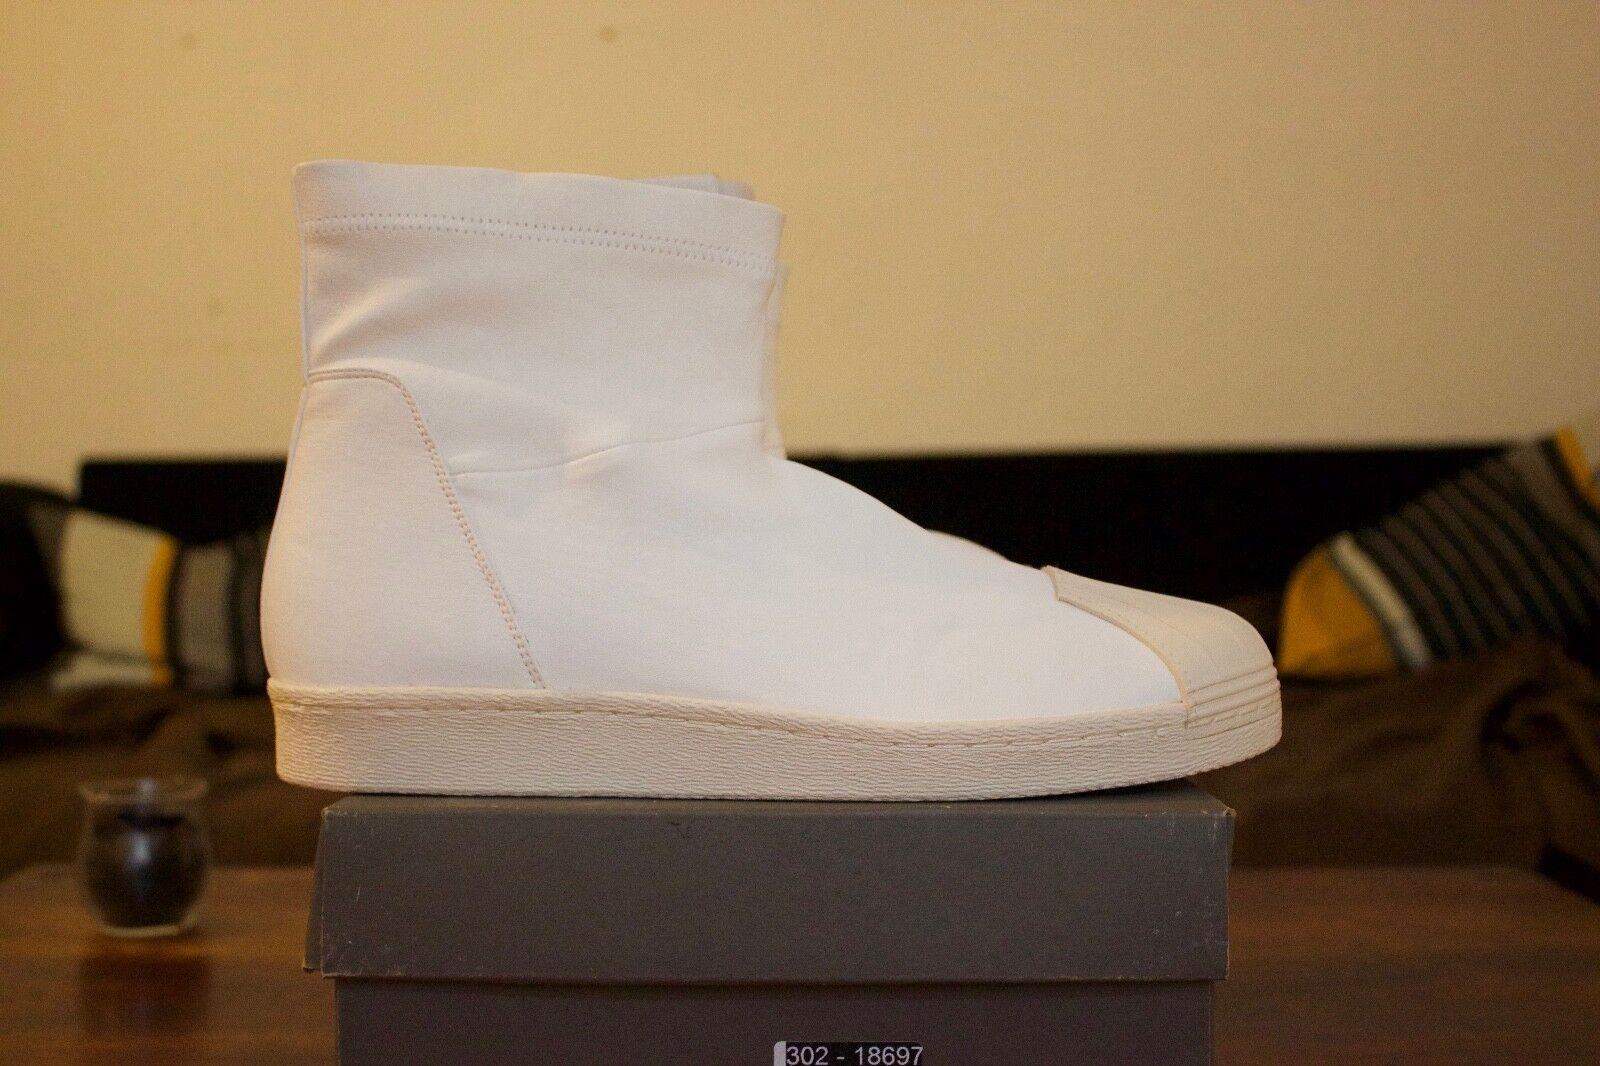 Adidas x Rick Owens Ankle Boot Superstar Bone/White US 10.5 / EUR 44.5